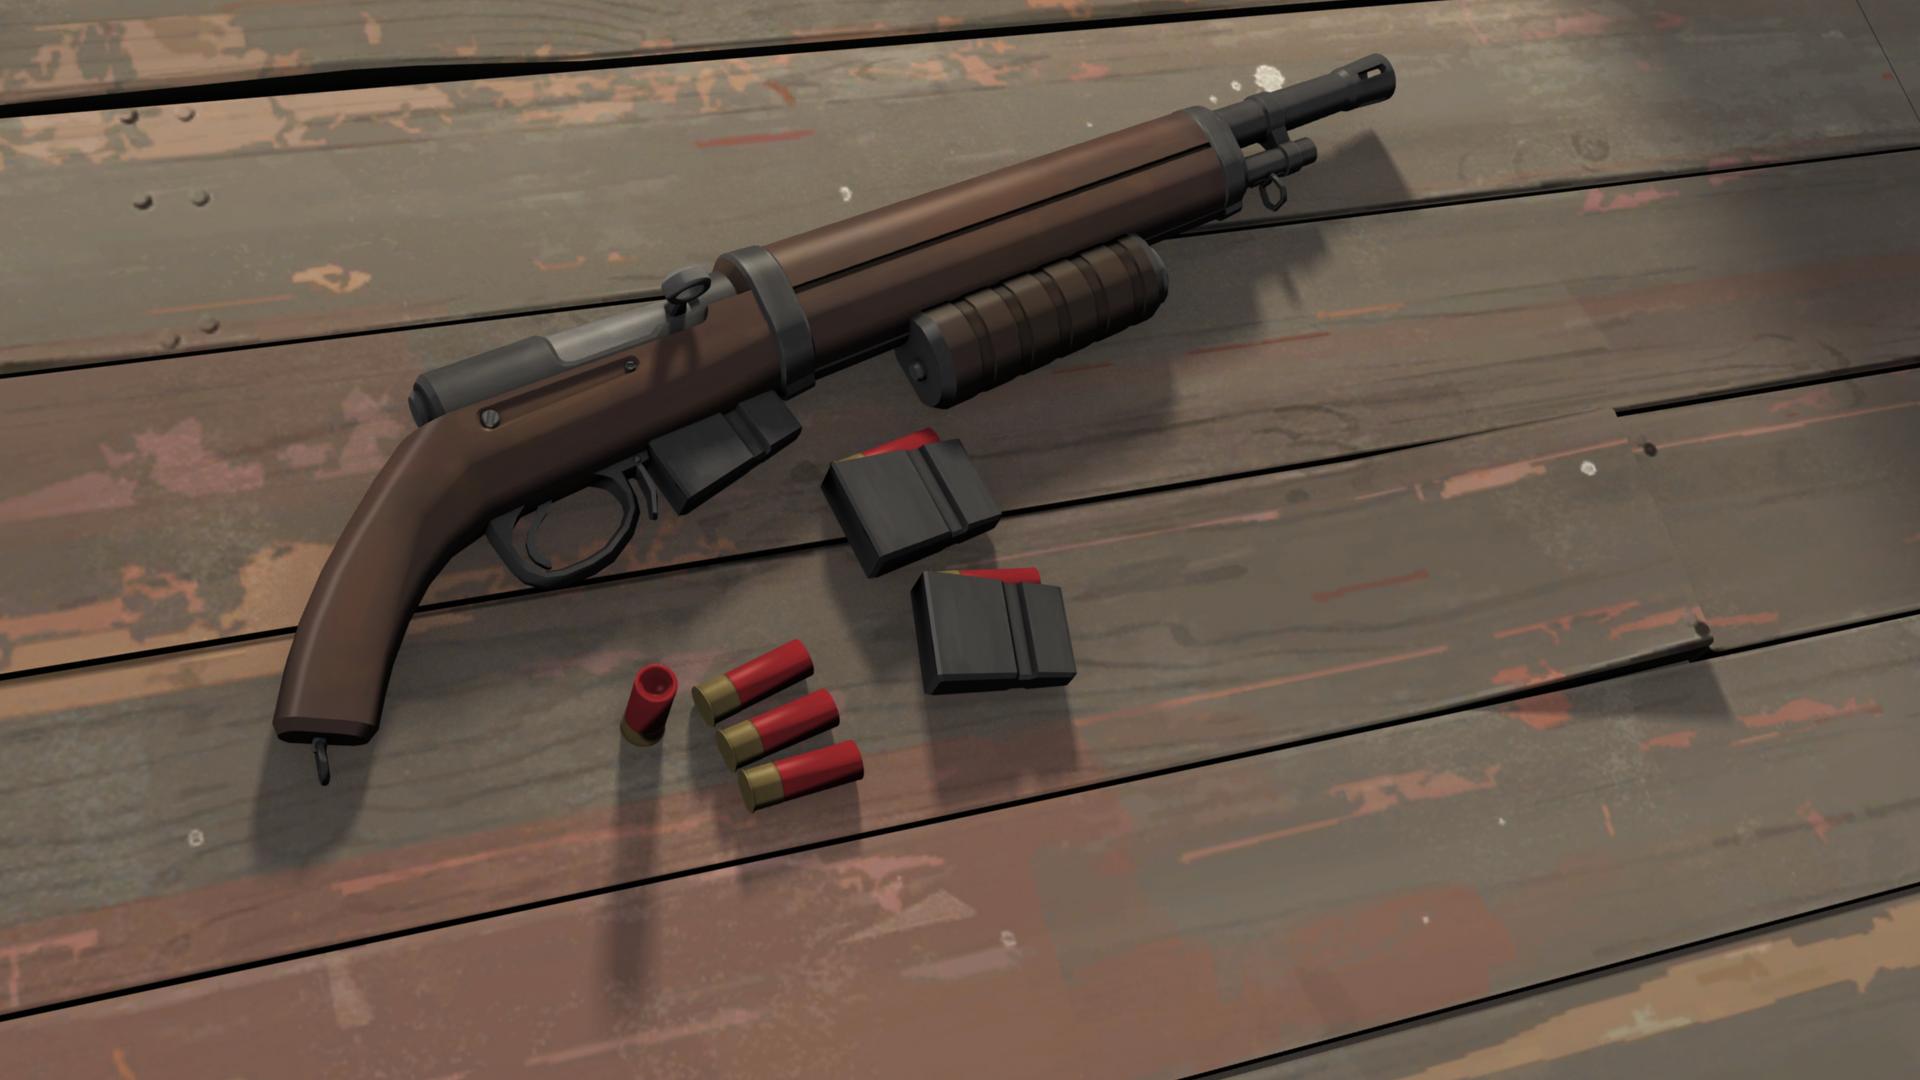 TF2 Pump Shotgun Wallpaper by JoshuaMK2 on DeviantArt